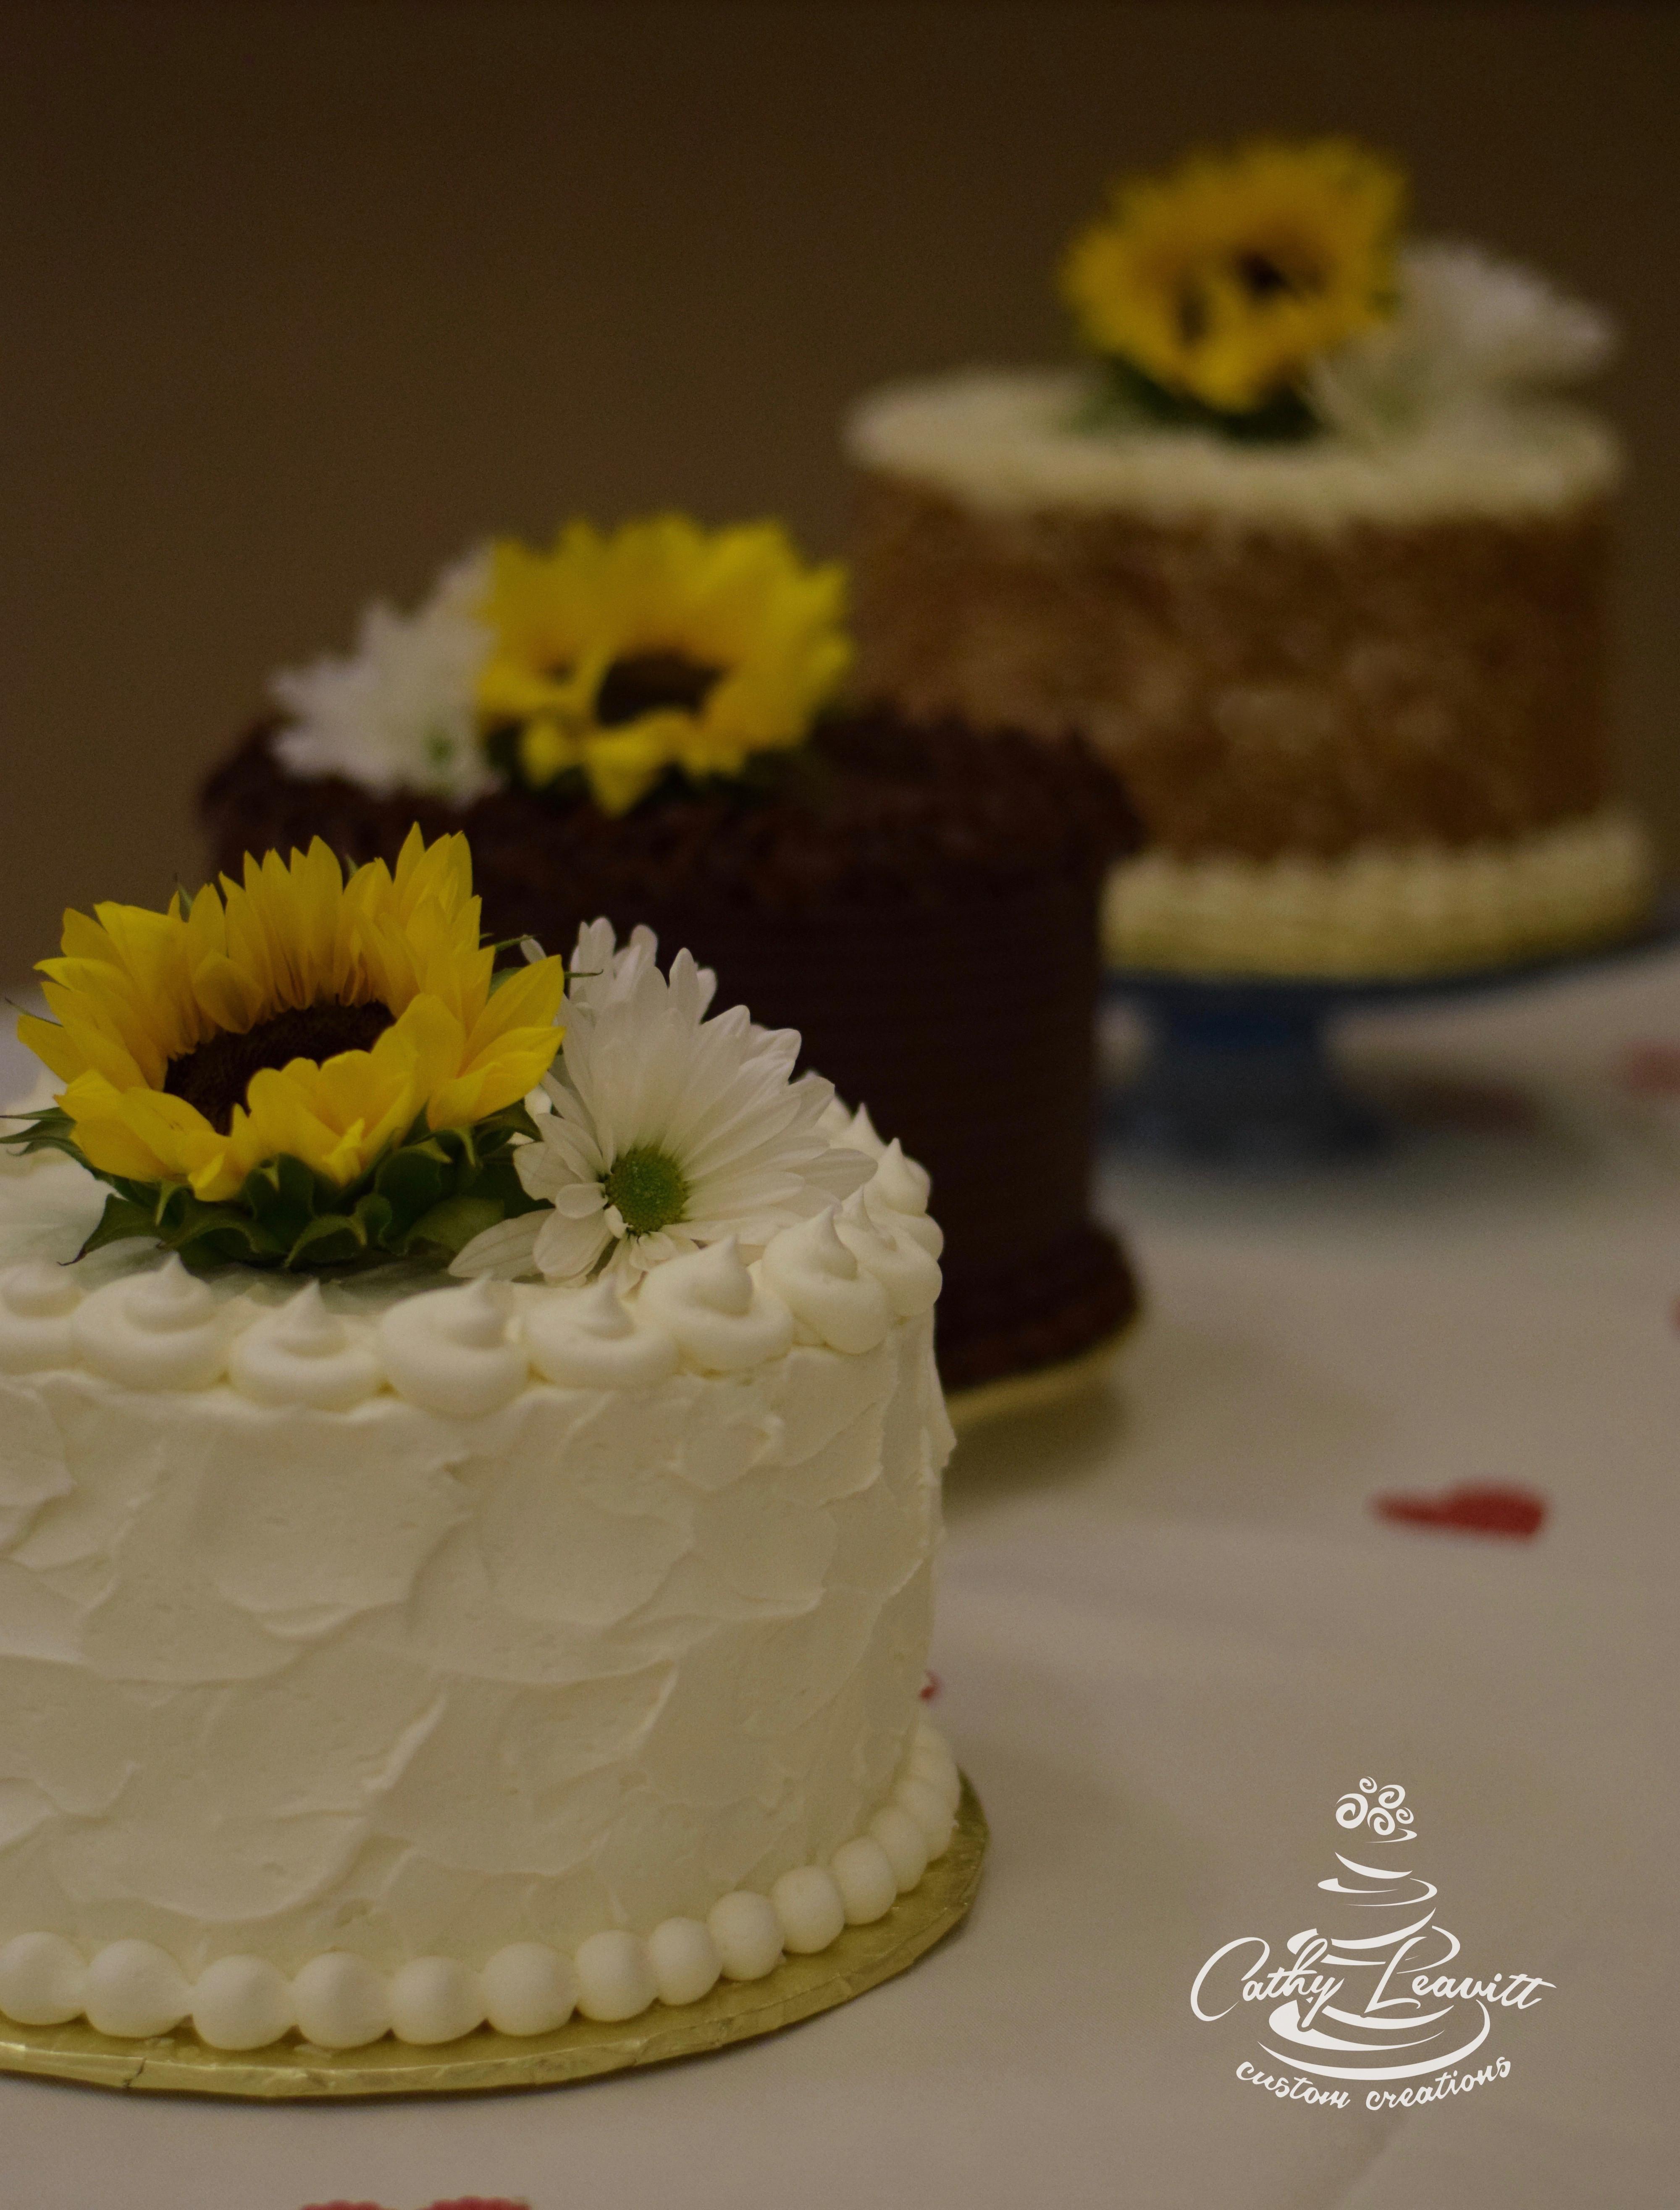 Dessert Colorado Springs  Specialty dessert cakes Cathy Leavitt custom creations